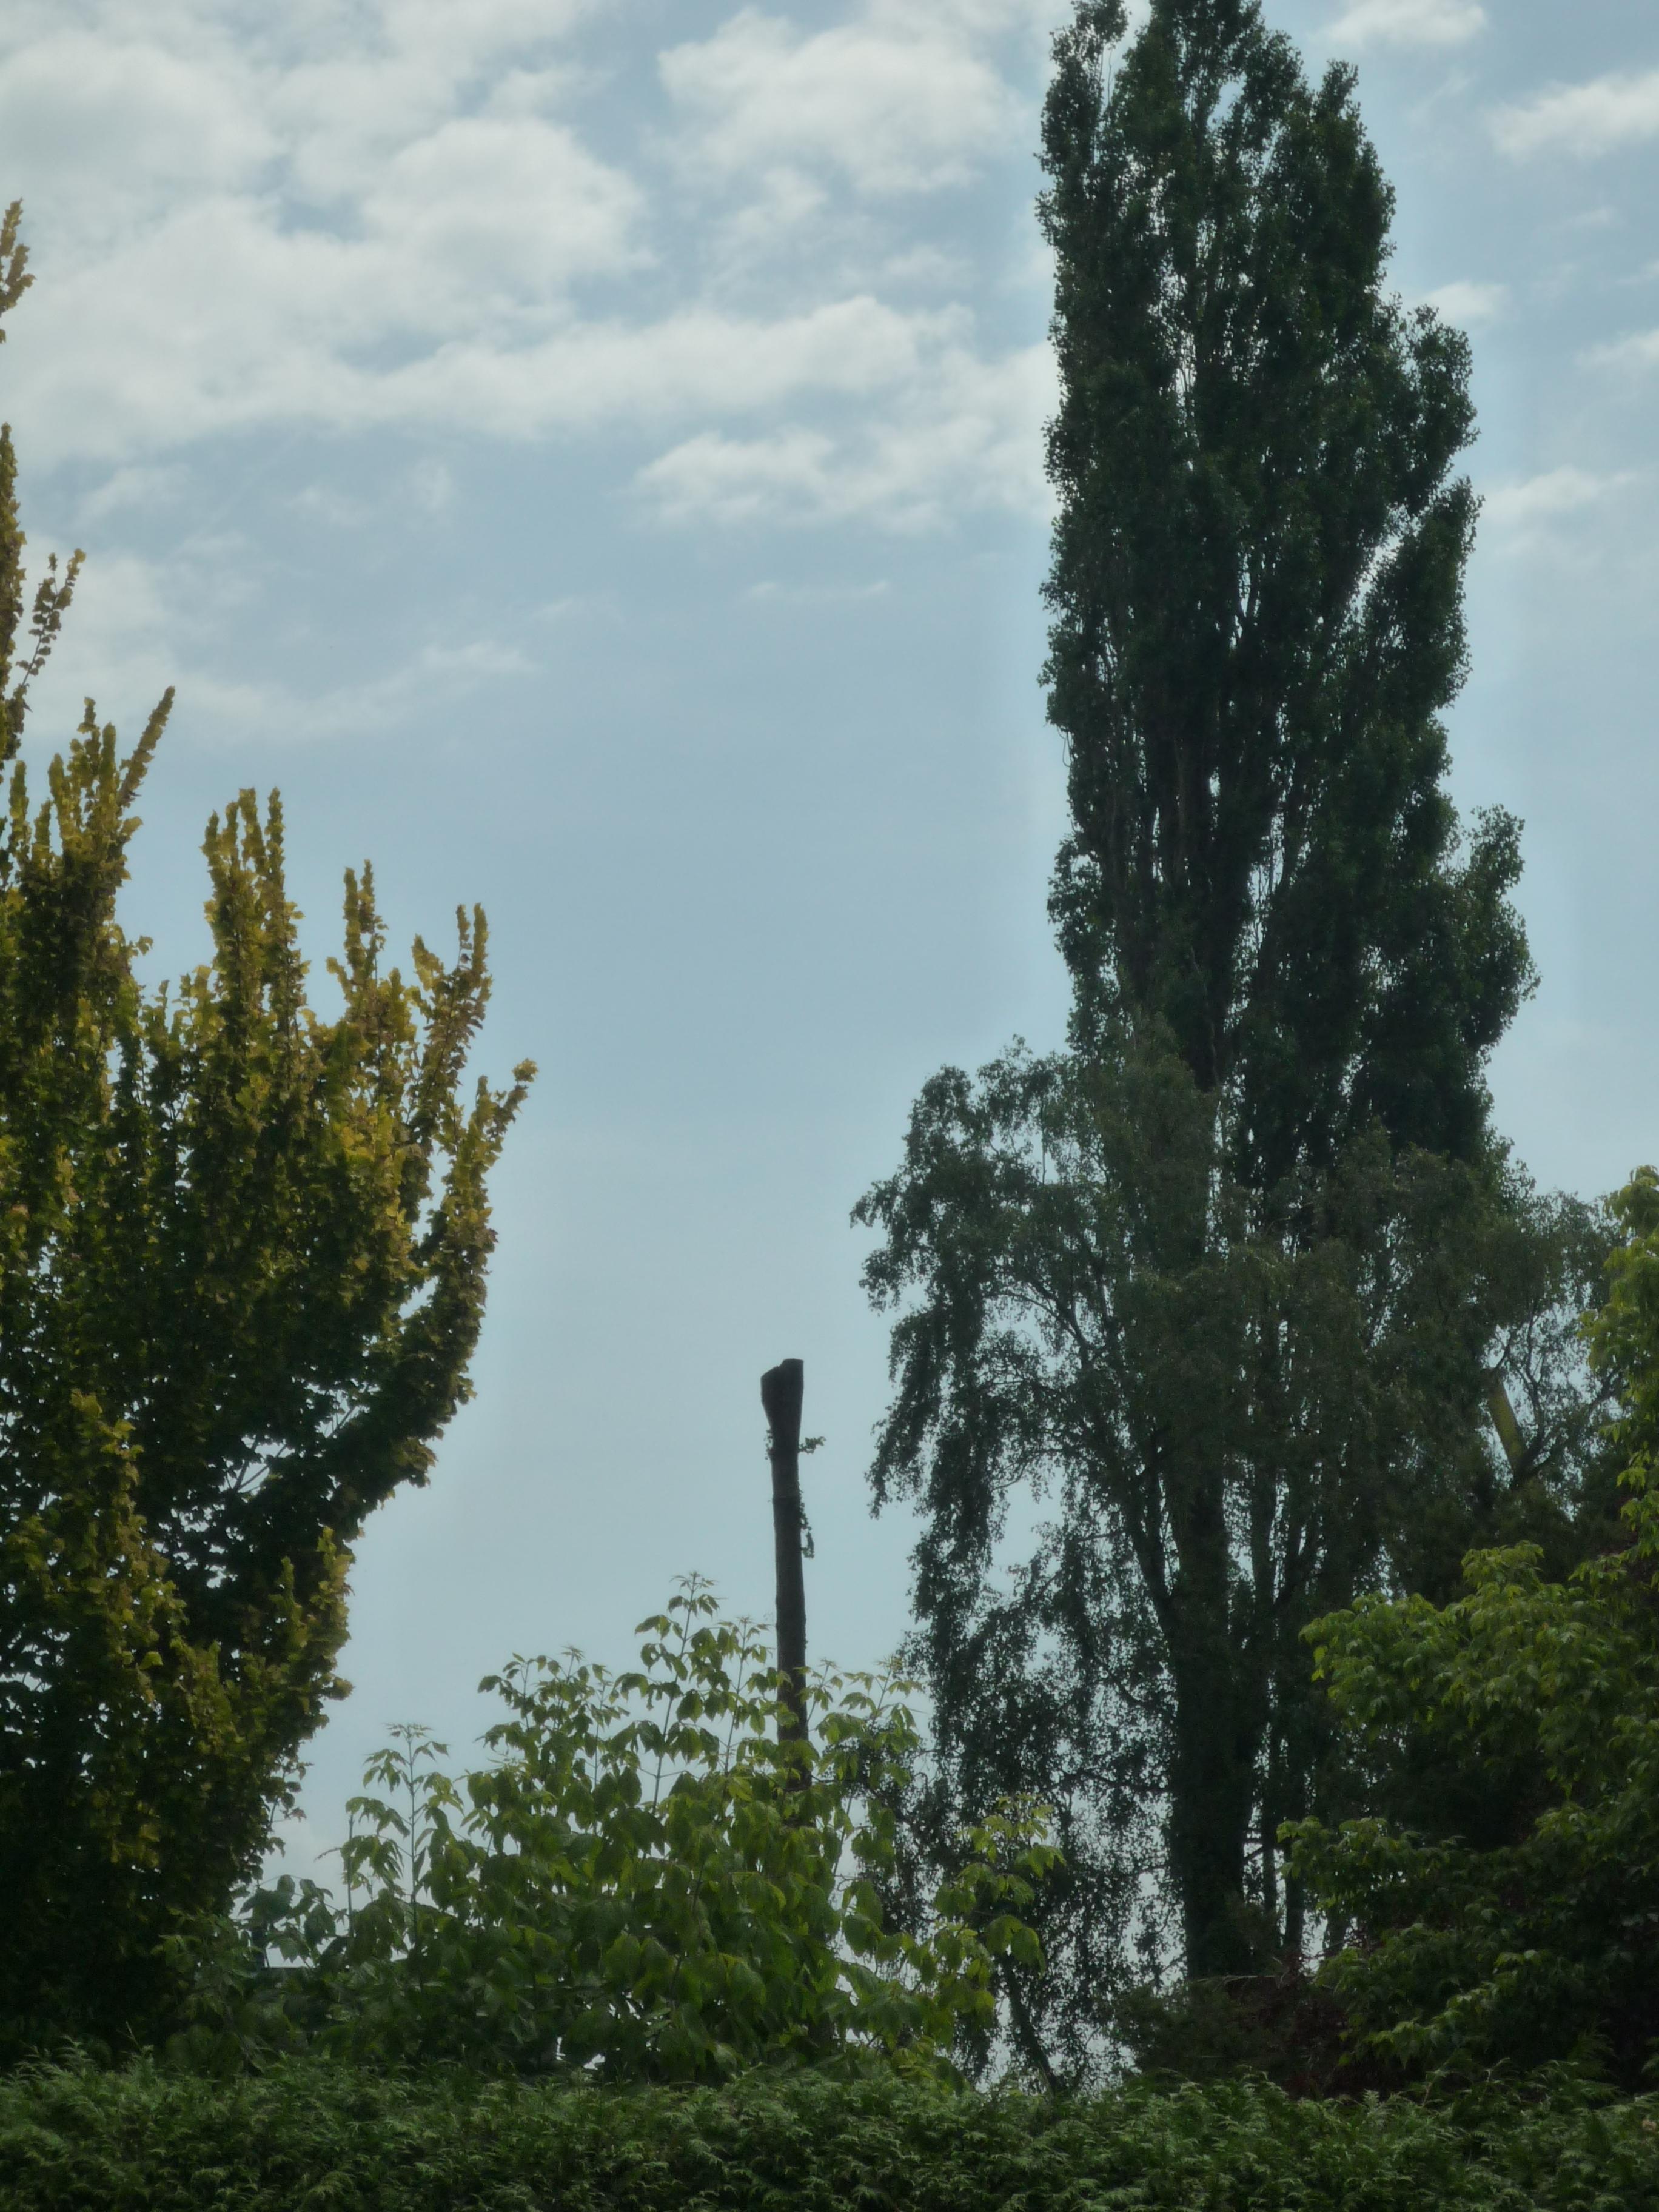 Dertig meter hoge bomen geveld